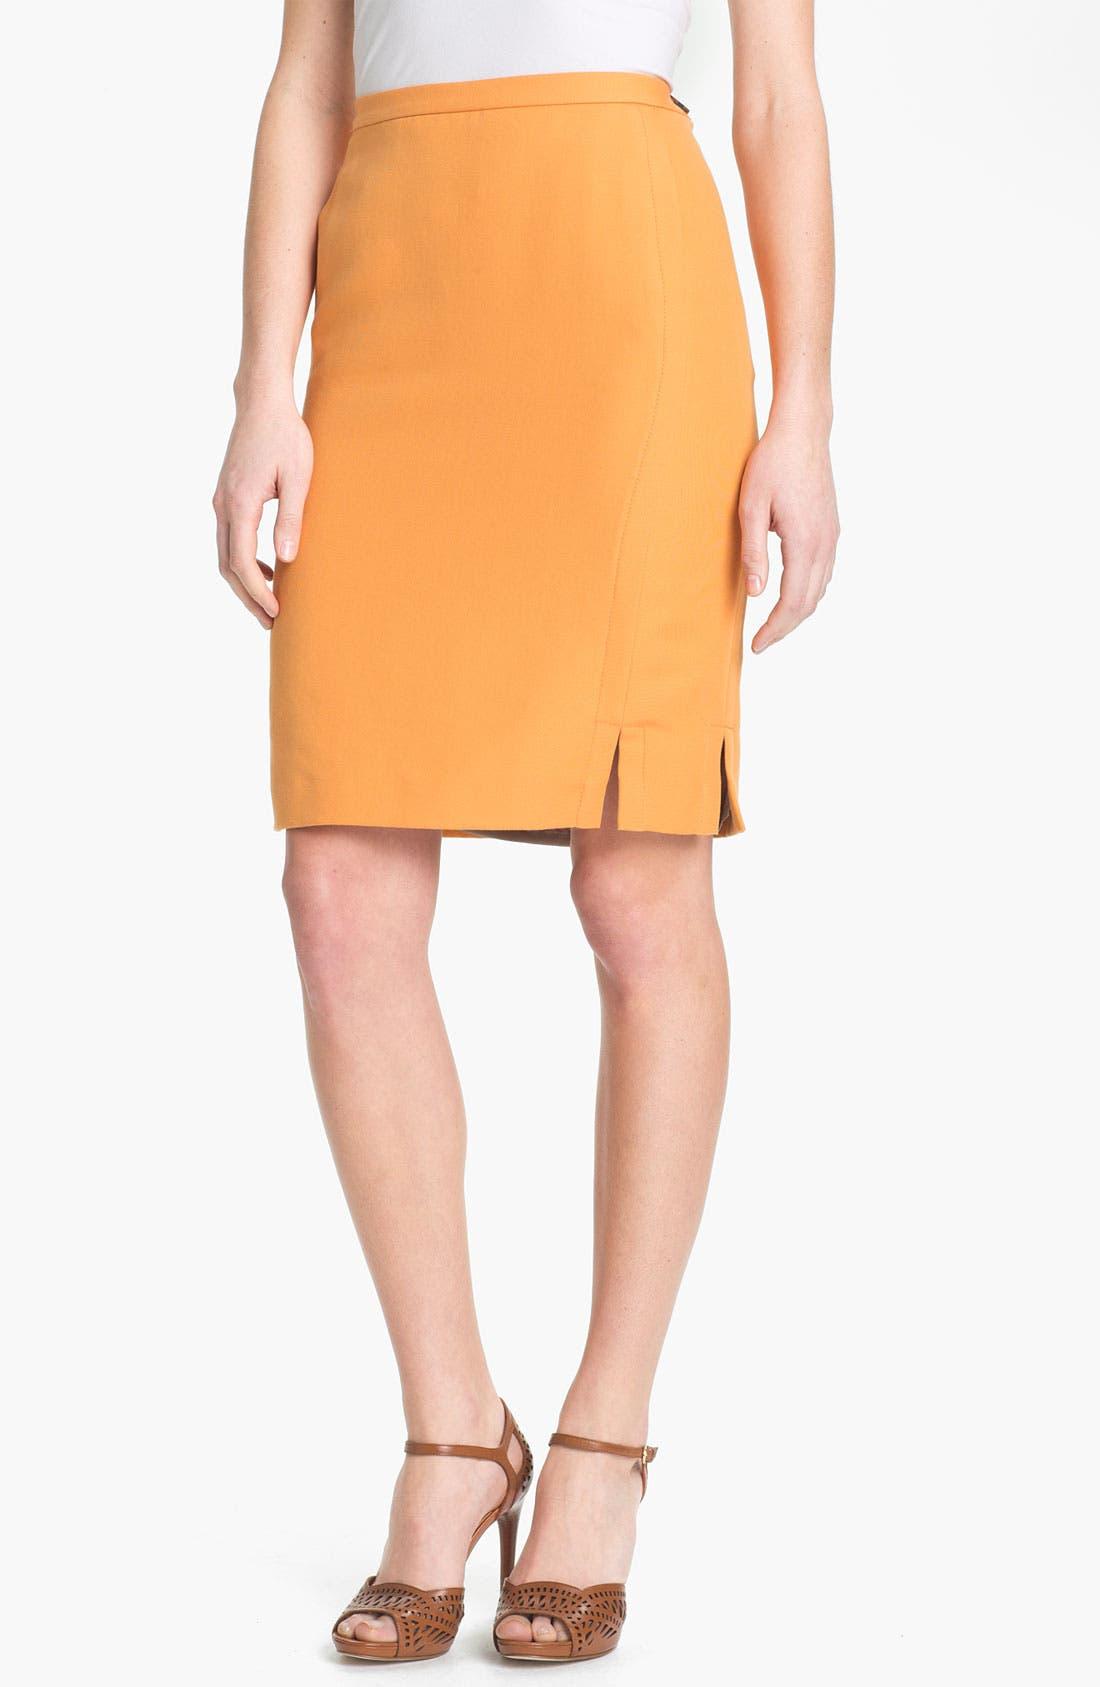 Alternate Image 1 Selected - Lafayette 148 New York 'Sofia - Retro Cloth' Skirt